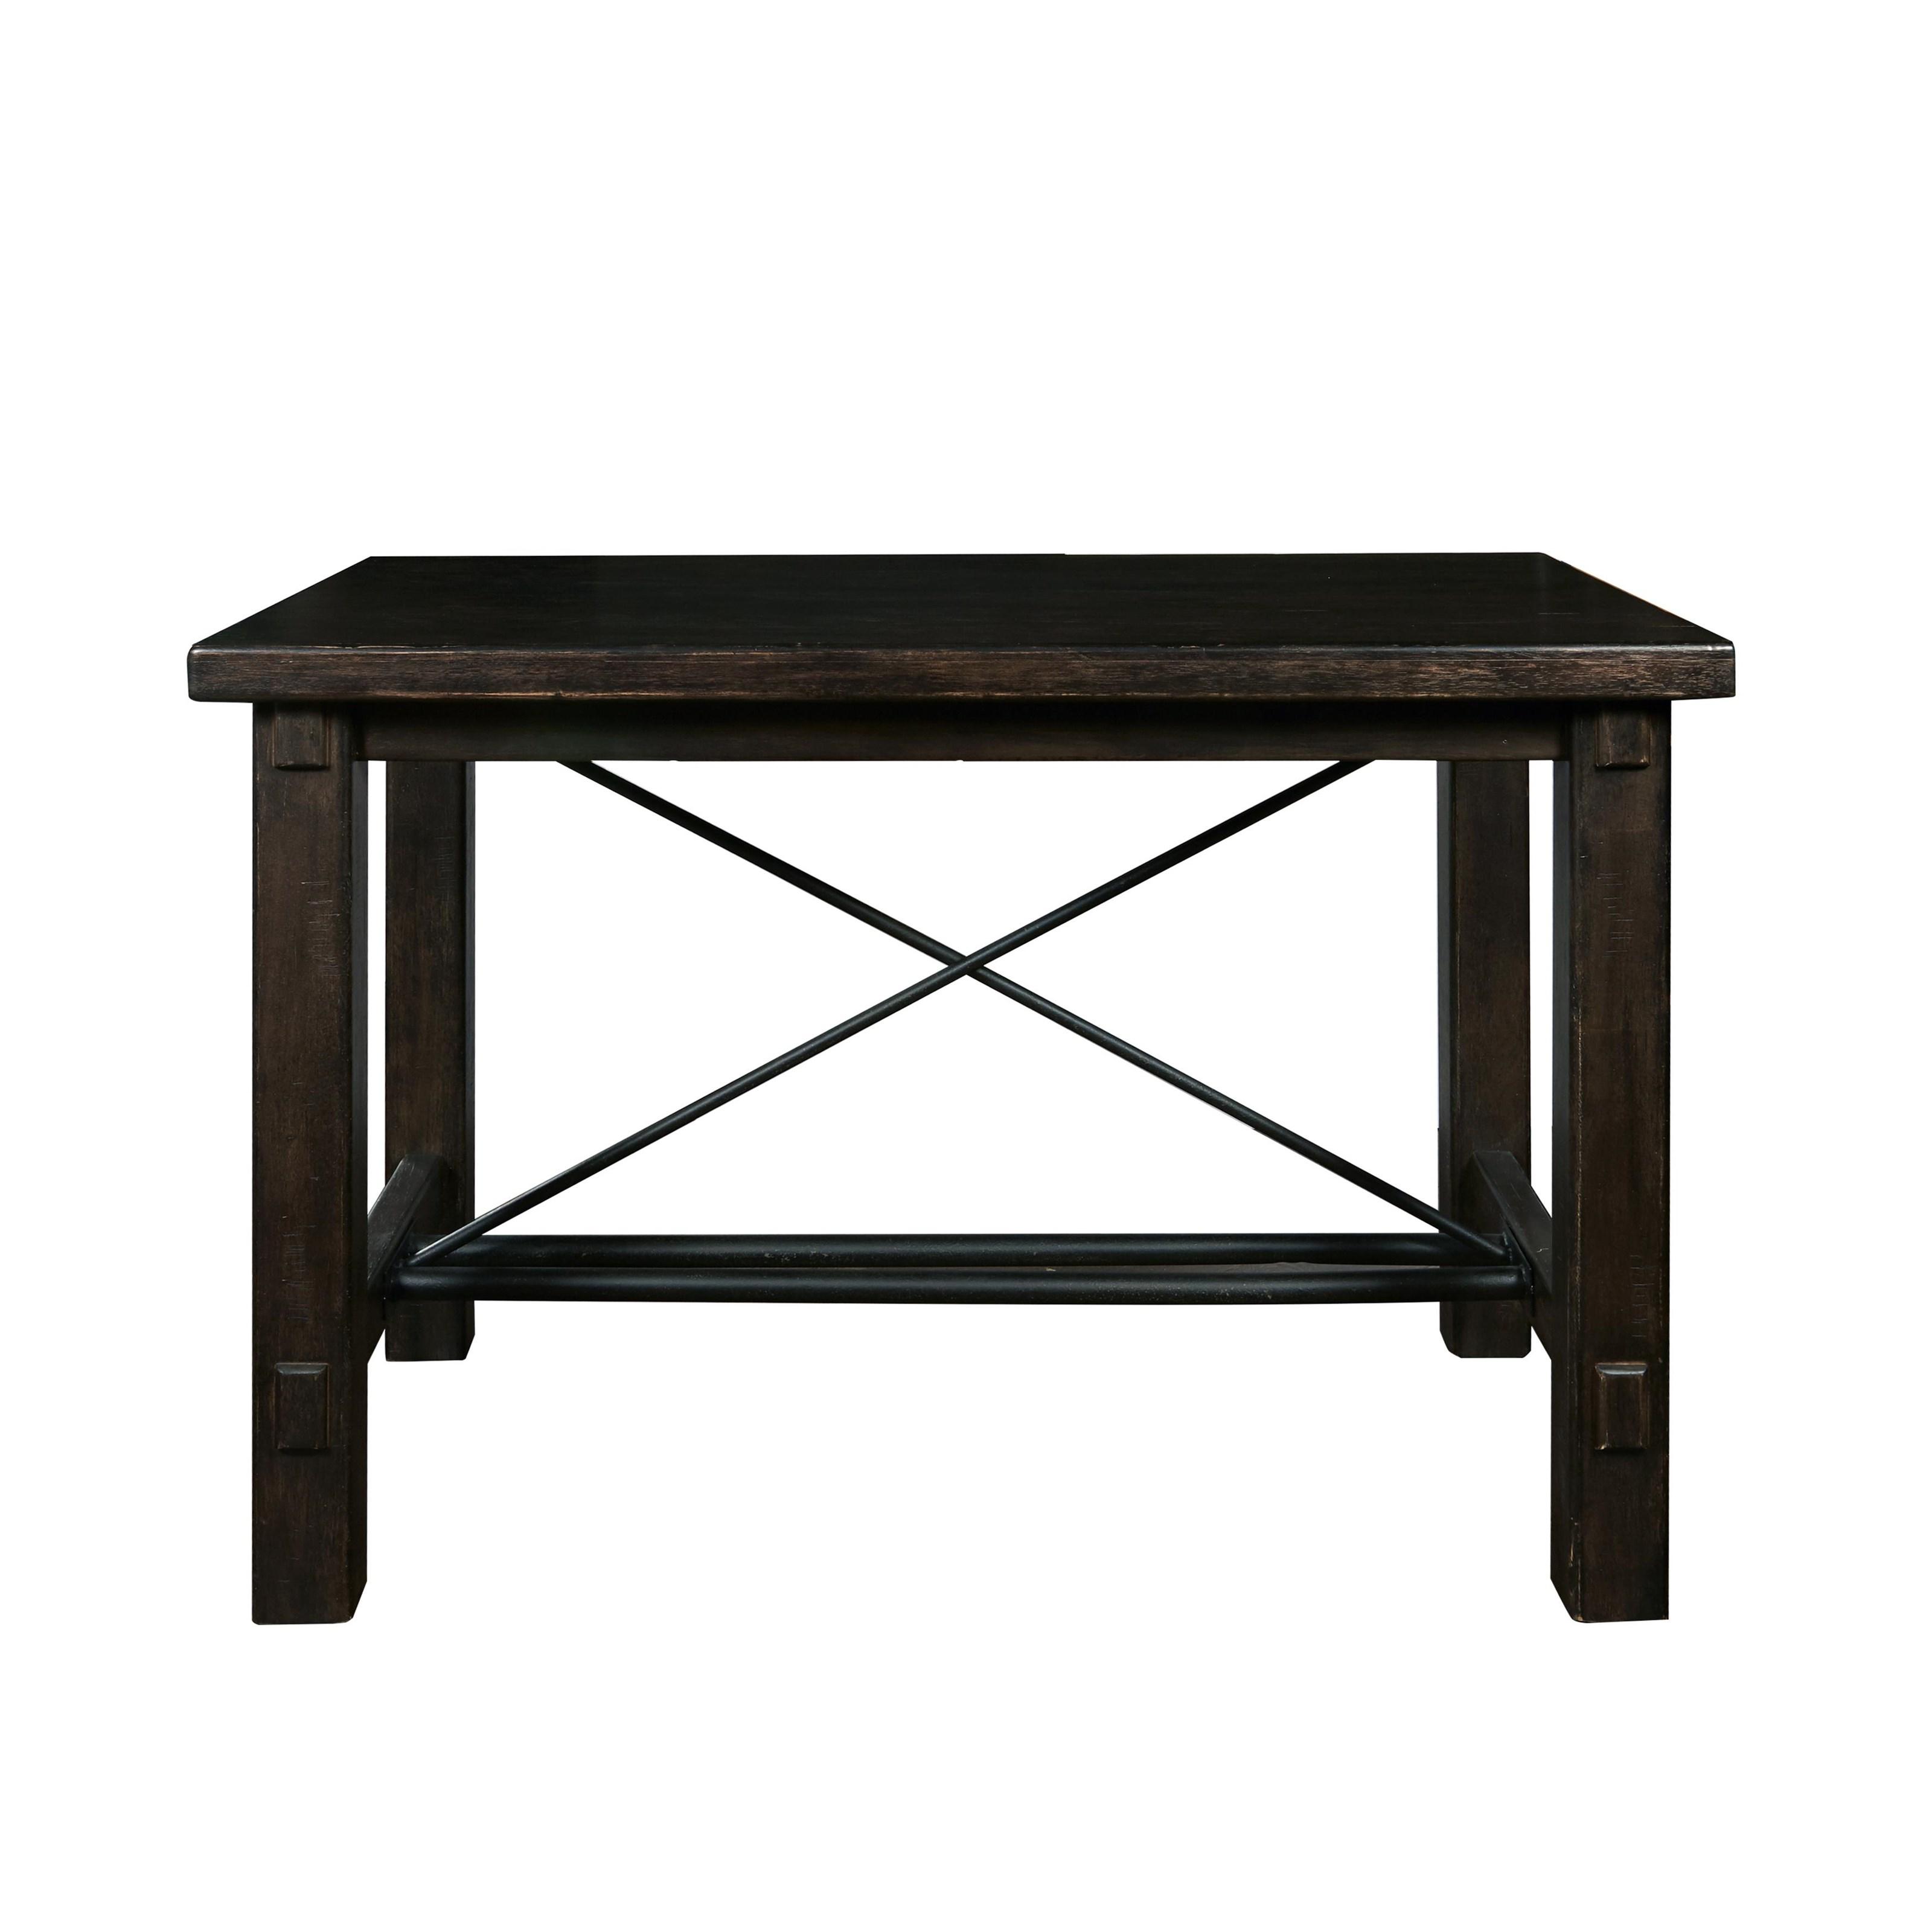 Morris Home Furnishings Beilsteine BeilSteine Bar Table - Item Number: 301228569